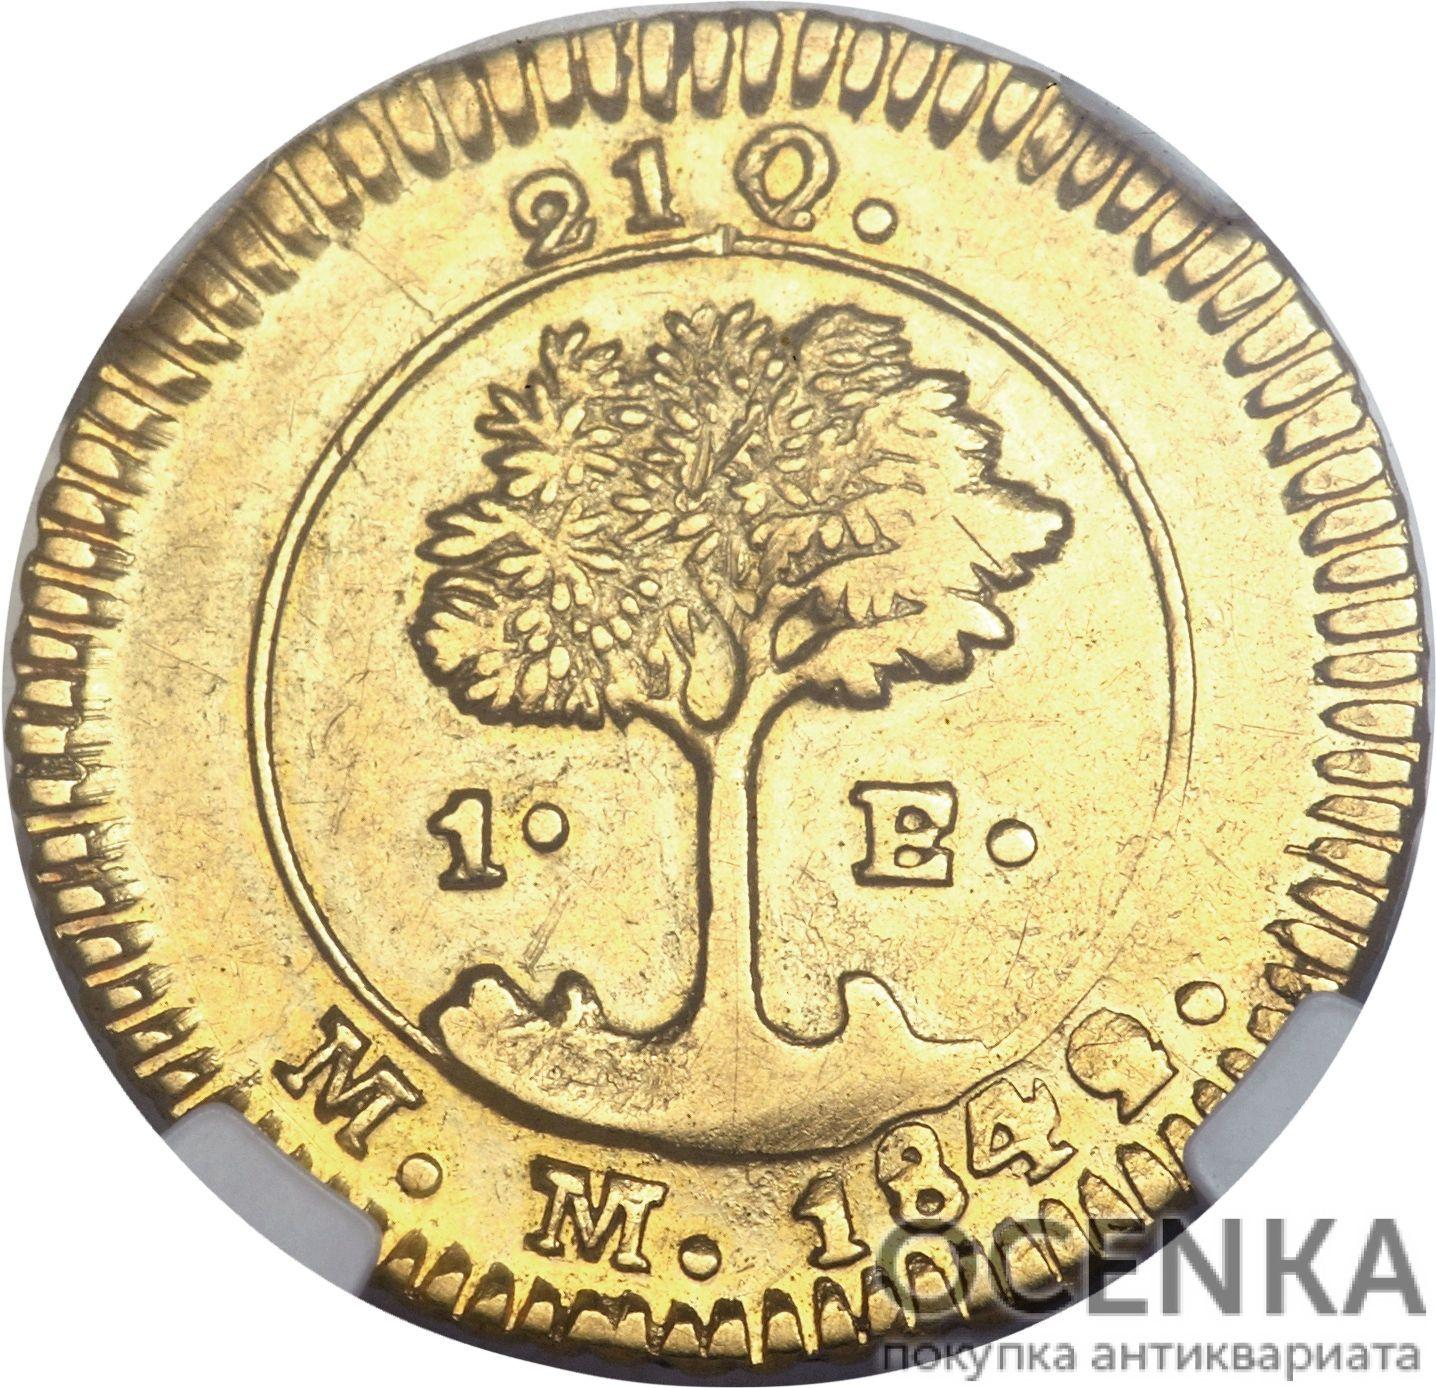 Золотая монета 1 Эскудо (1 Escudo) Коста Рика